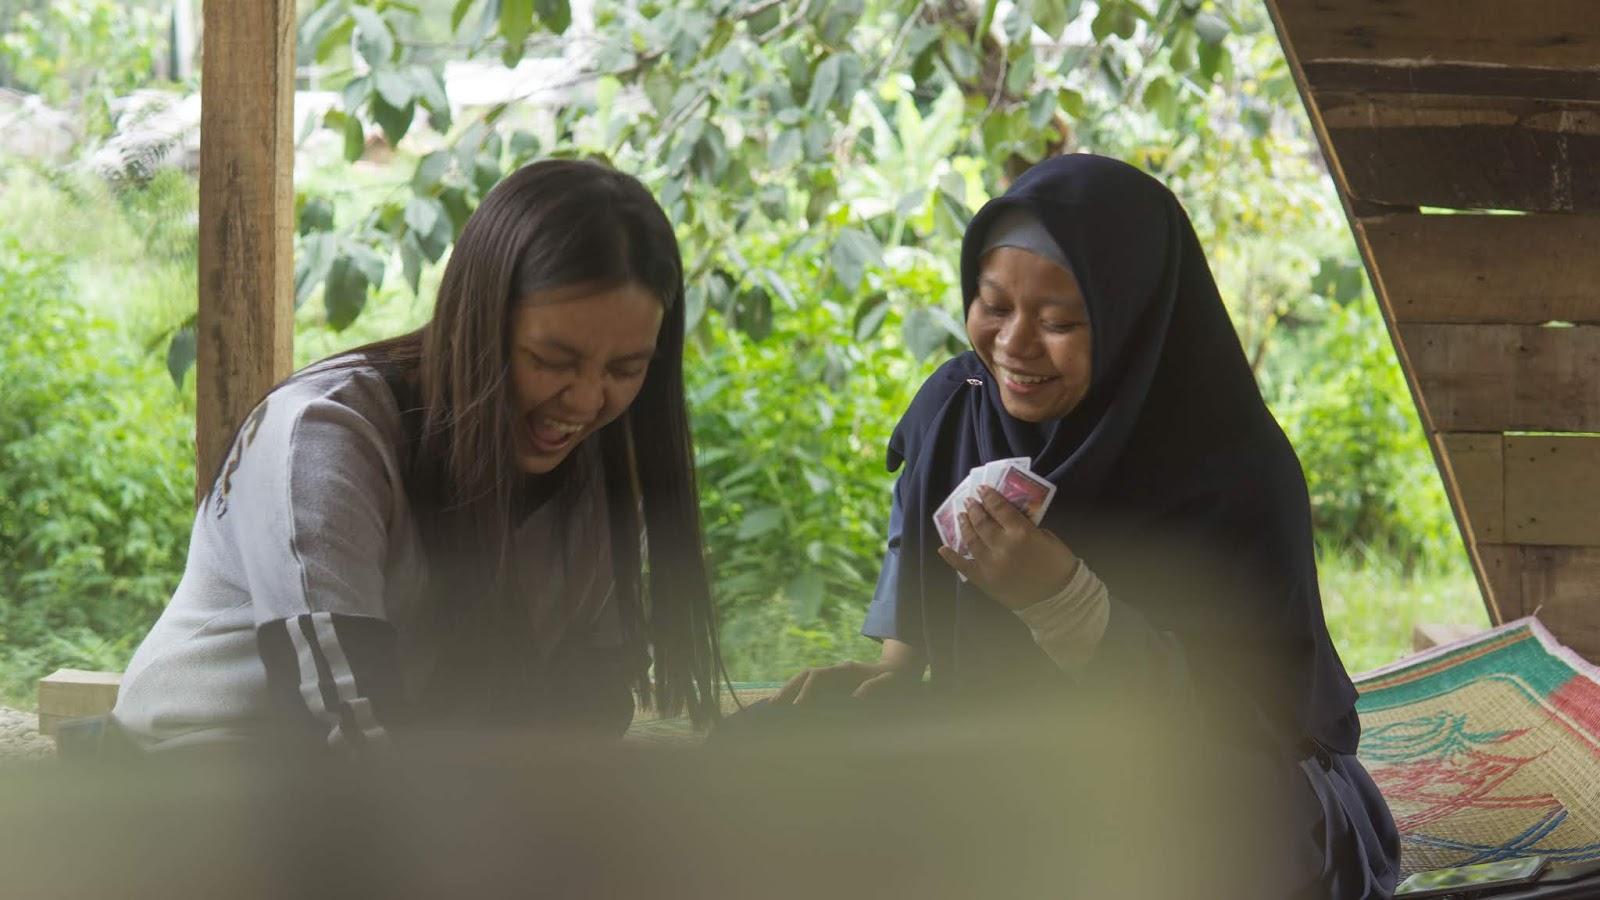 wisata alam kopi gunung ciwidey